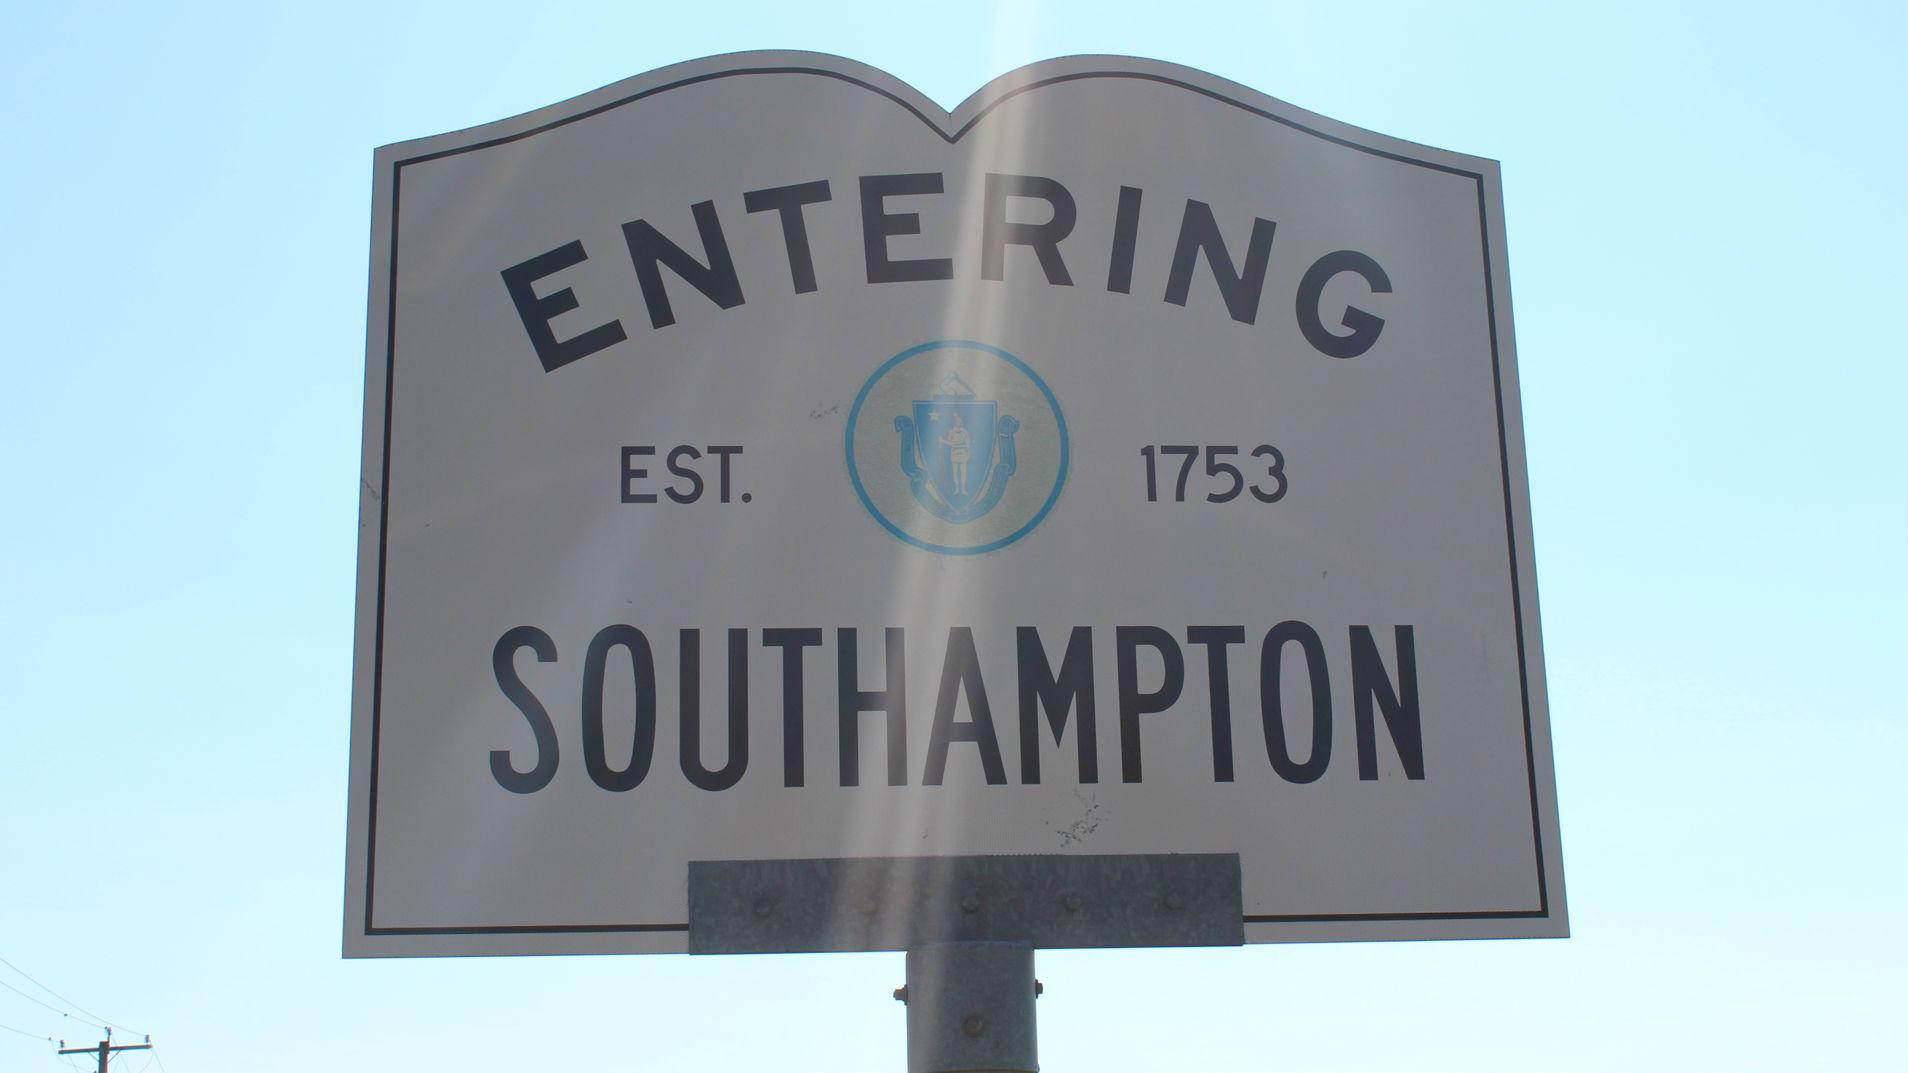 TownSigns_Southampton_1535410964945.jpg